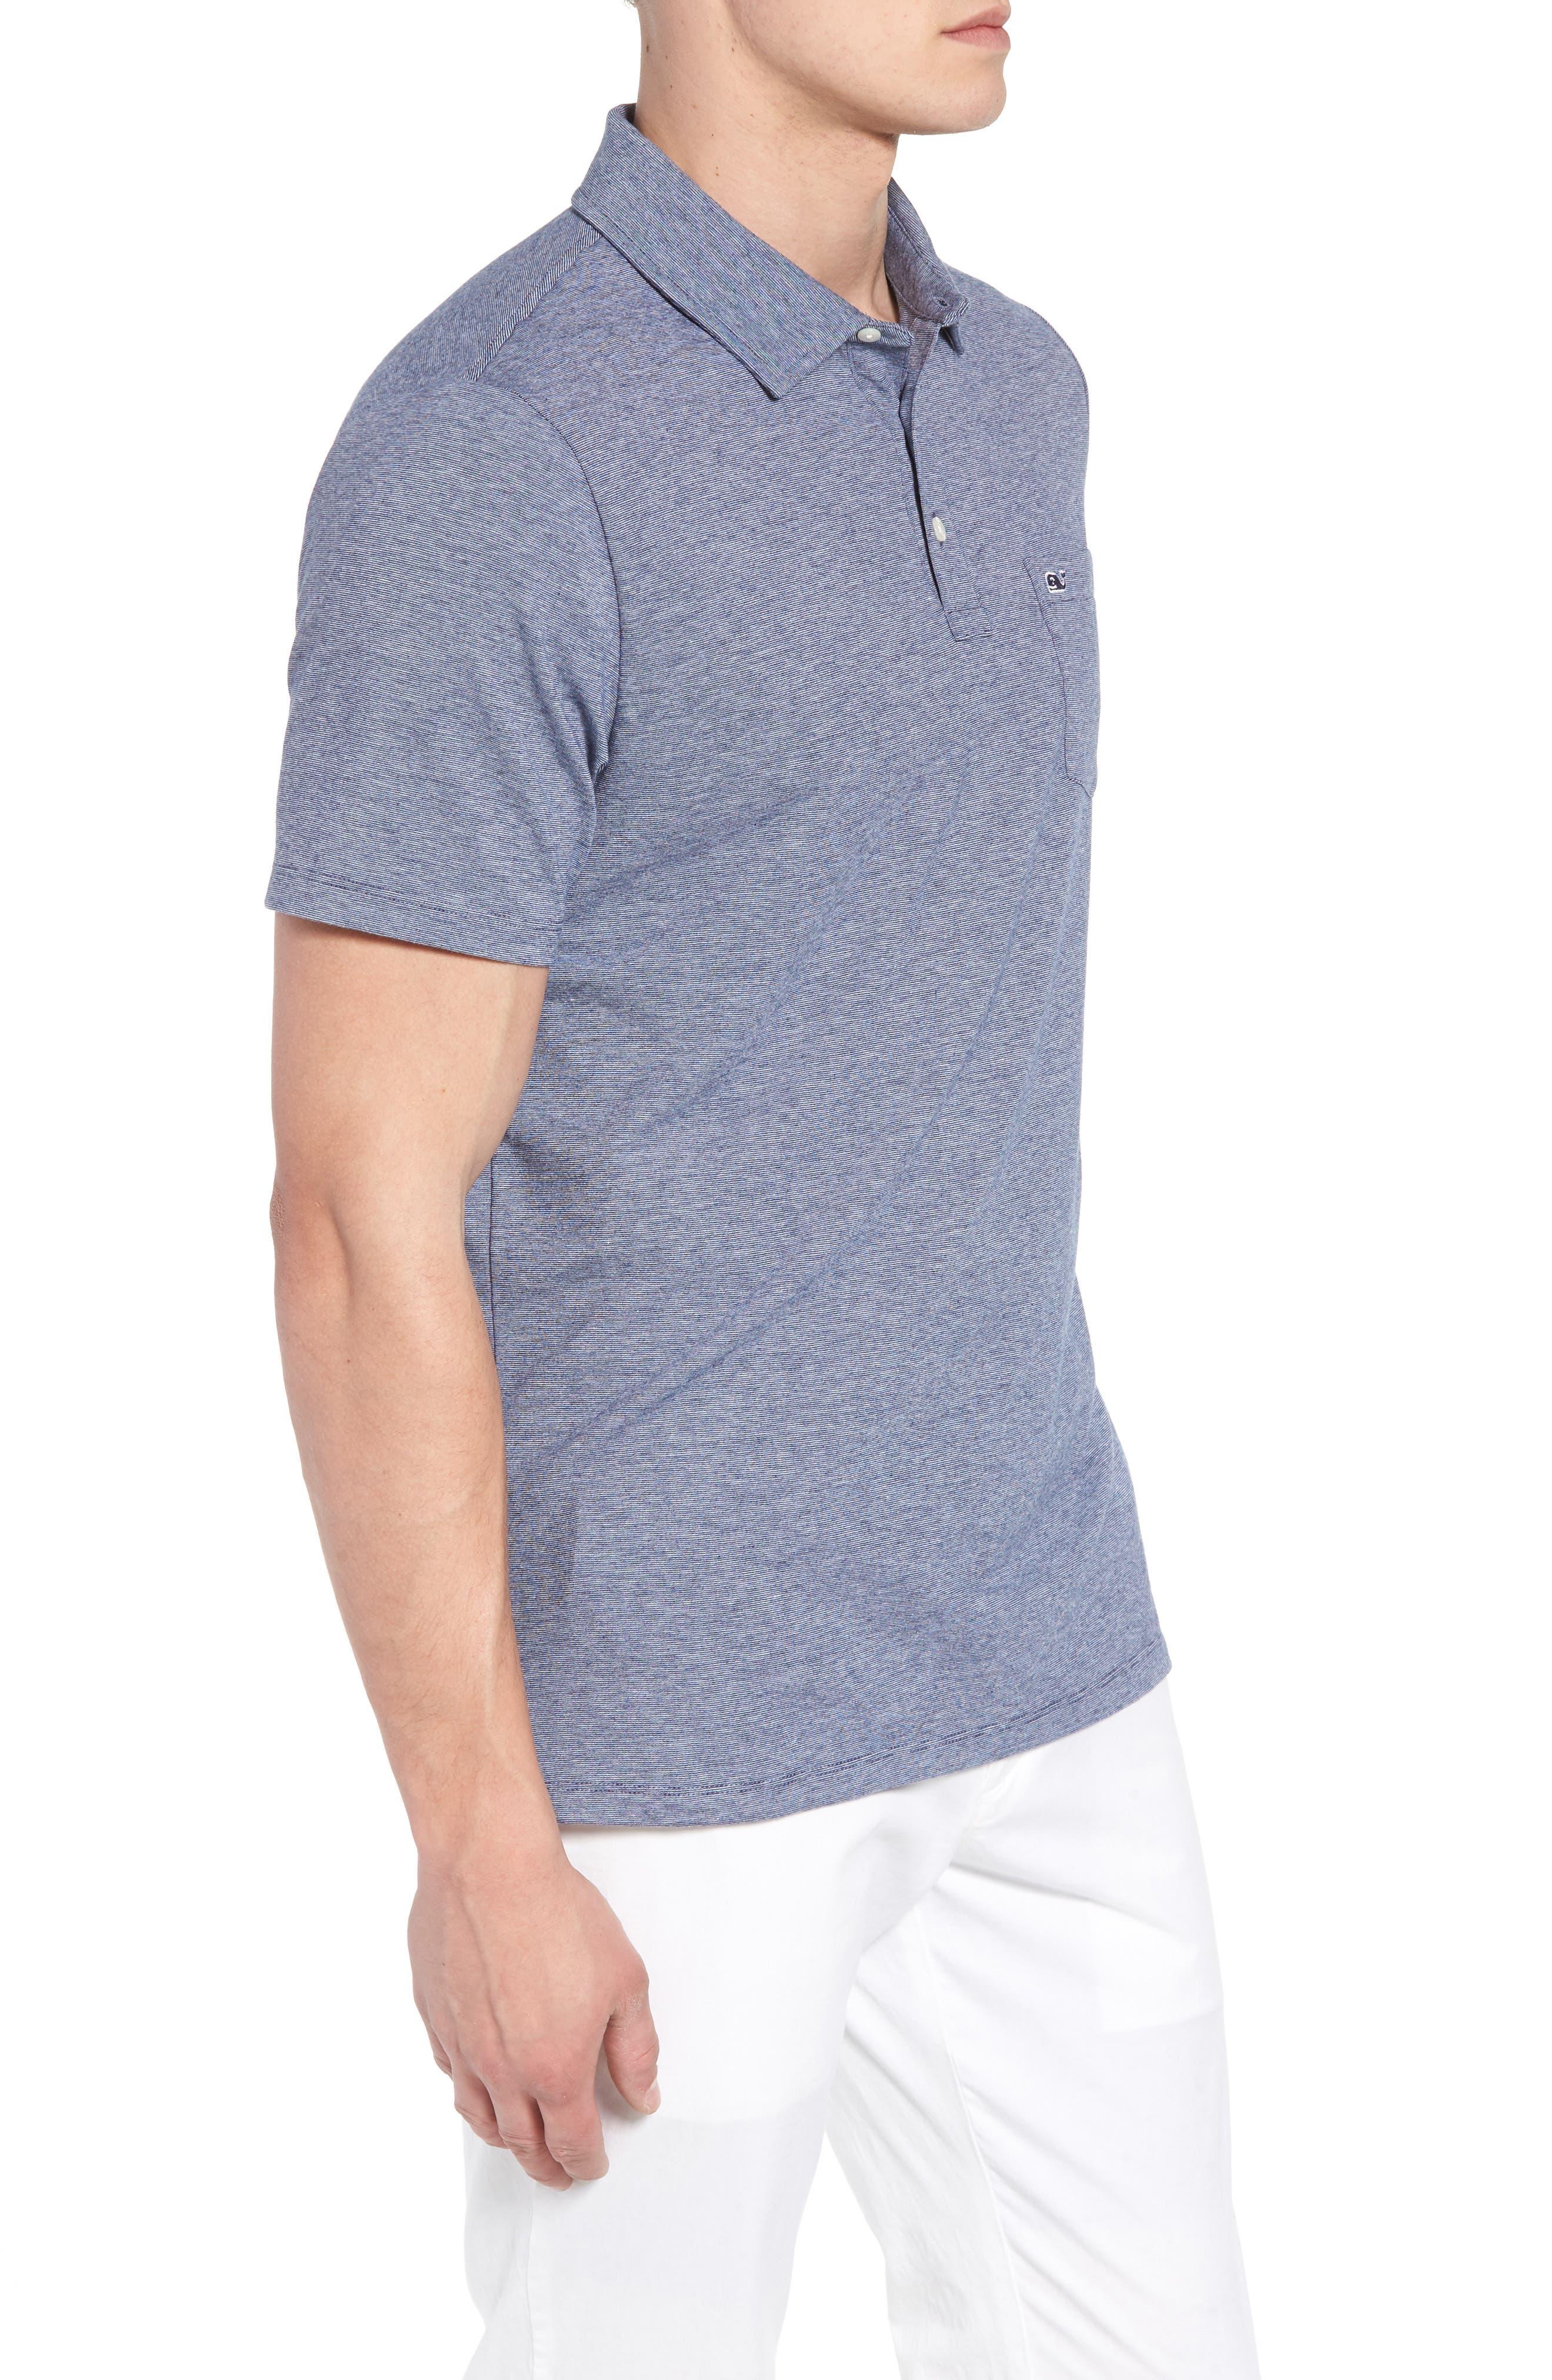 VINEYARD VINES,                             Edgartown Polo Shirt,                             Alternate thumbnail 3, color,                             DEEP BAY